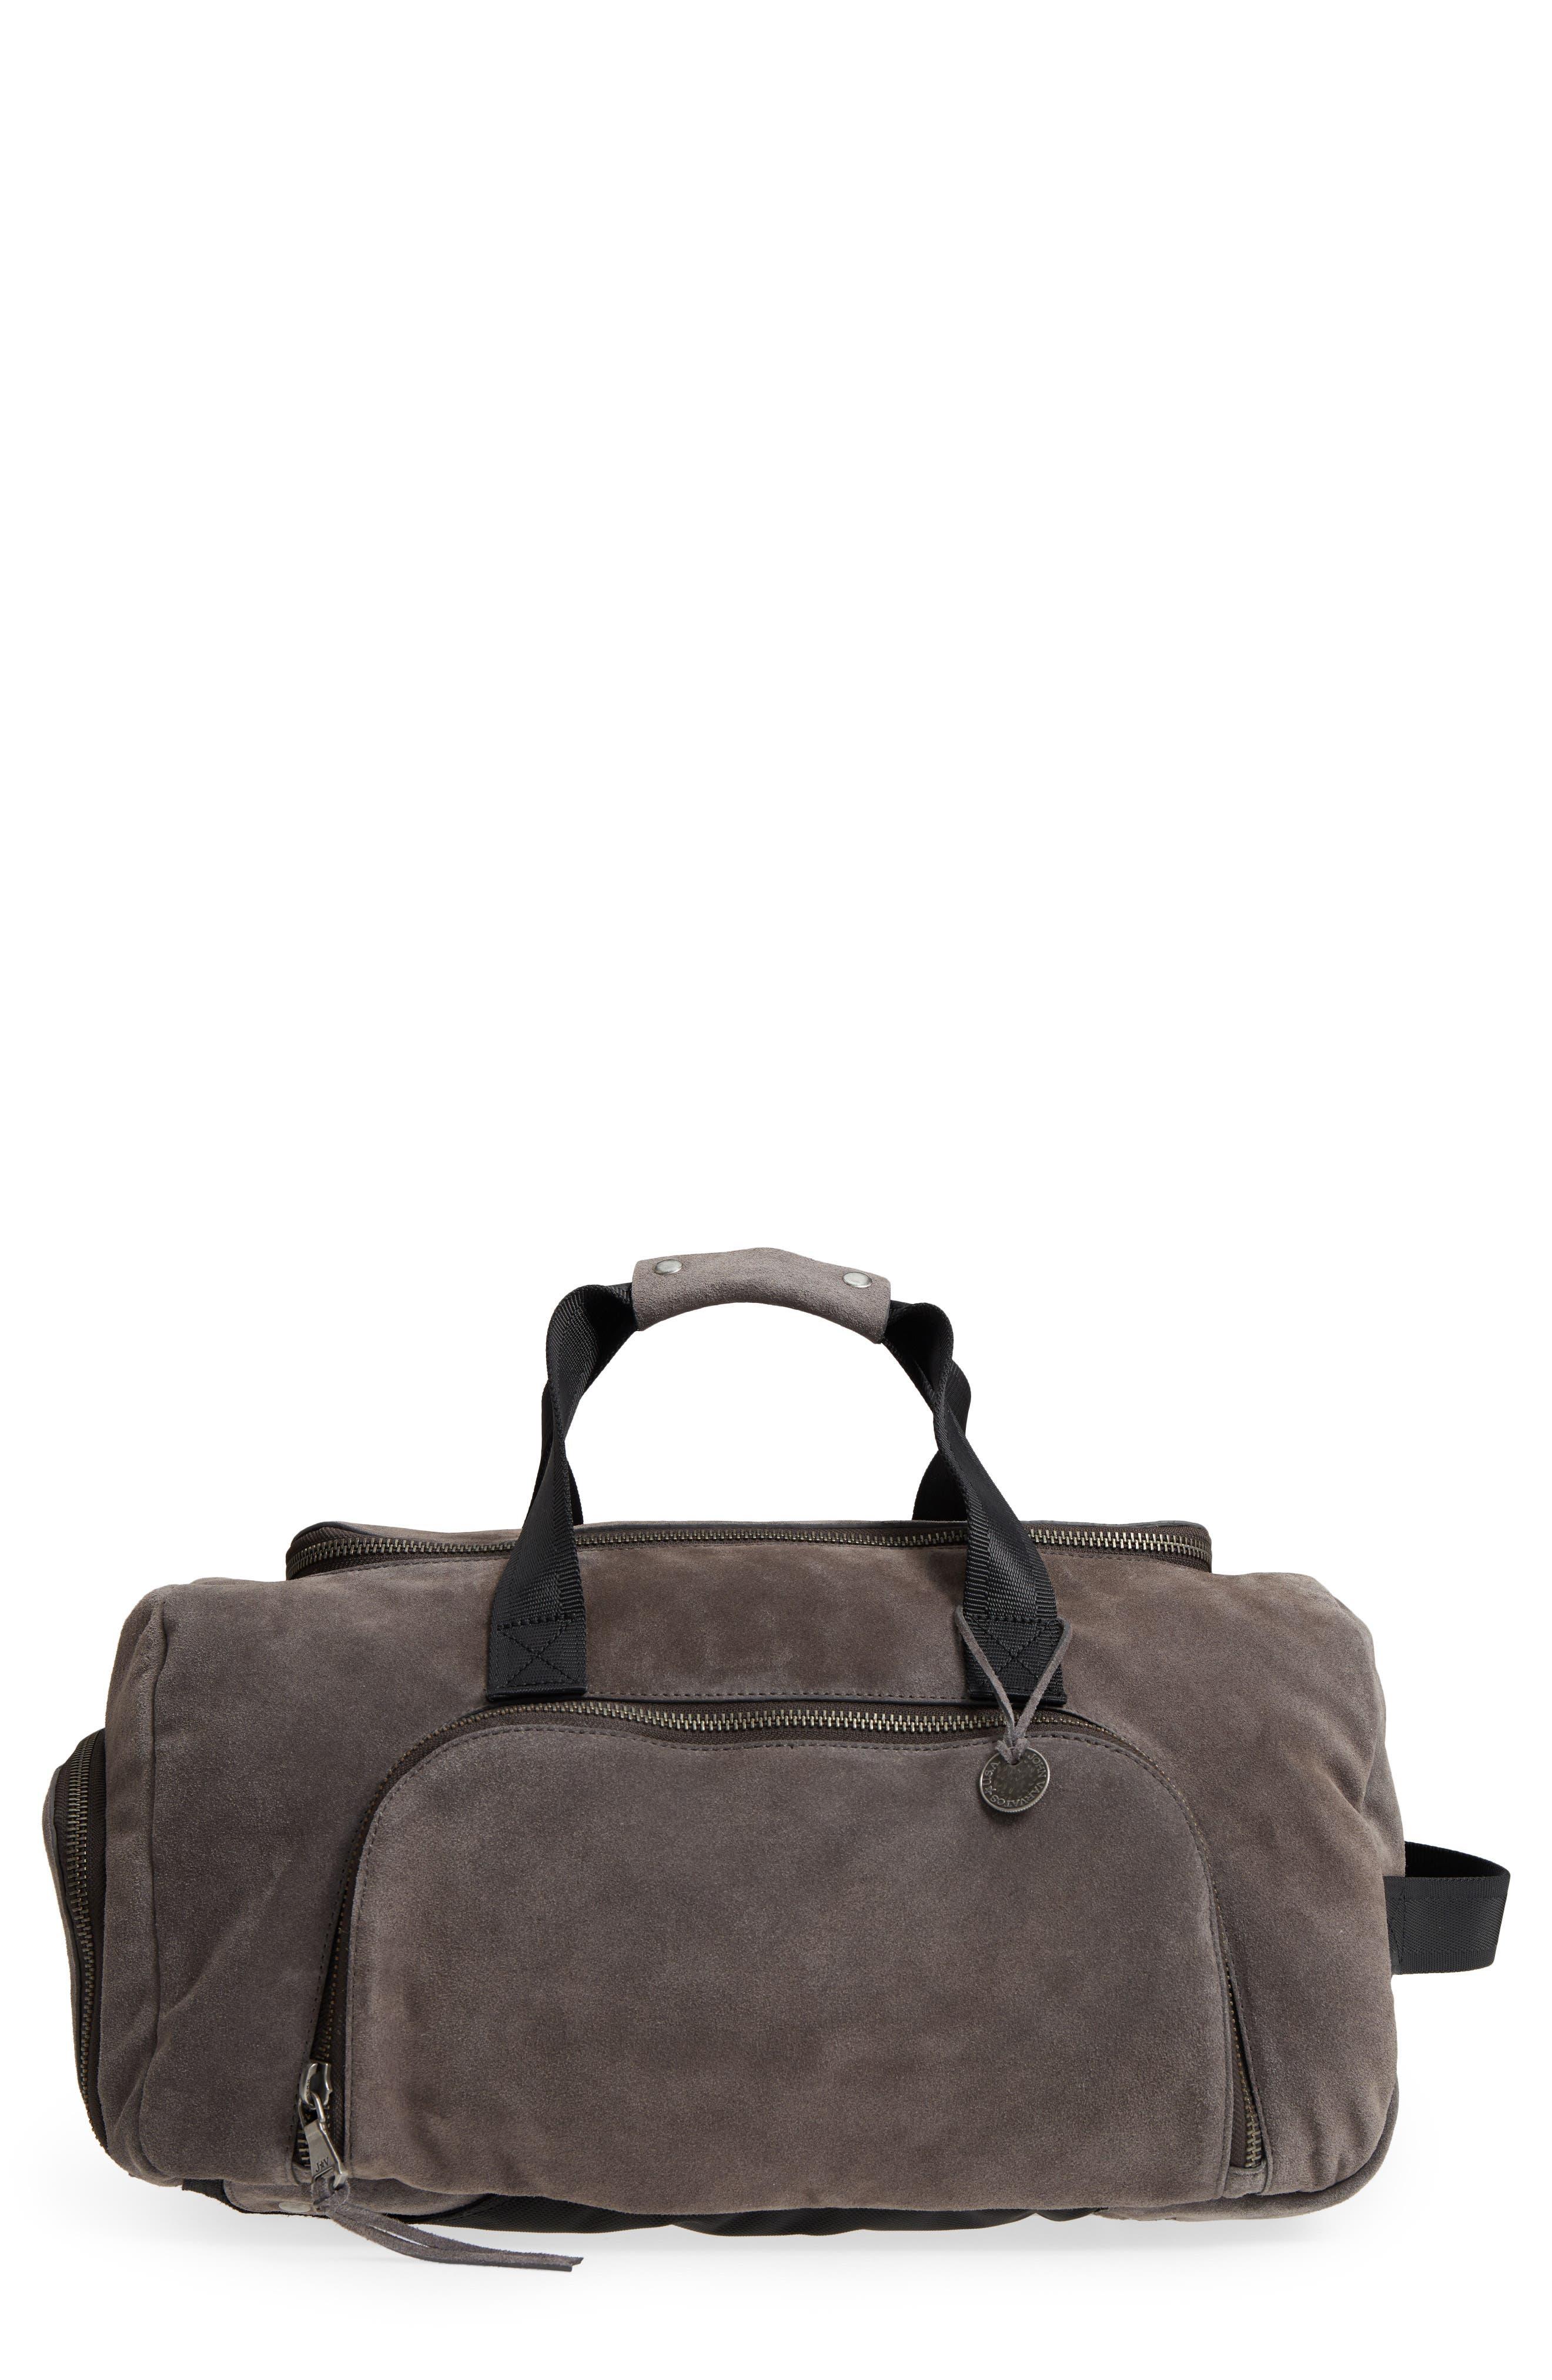 Brooklyn Suede Convertible Duffel Bag,                             Main thumbnail 1, color,